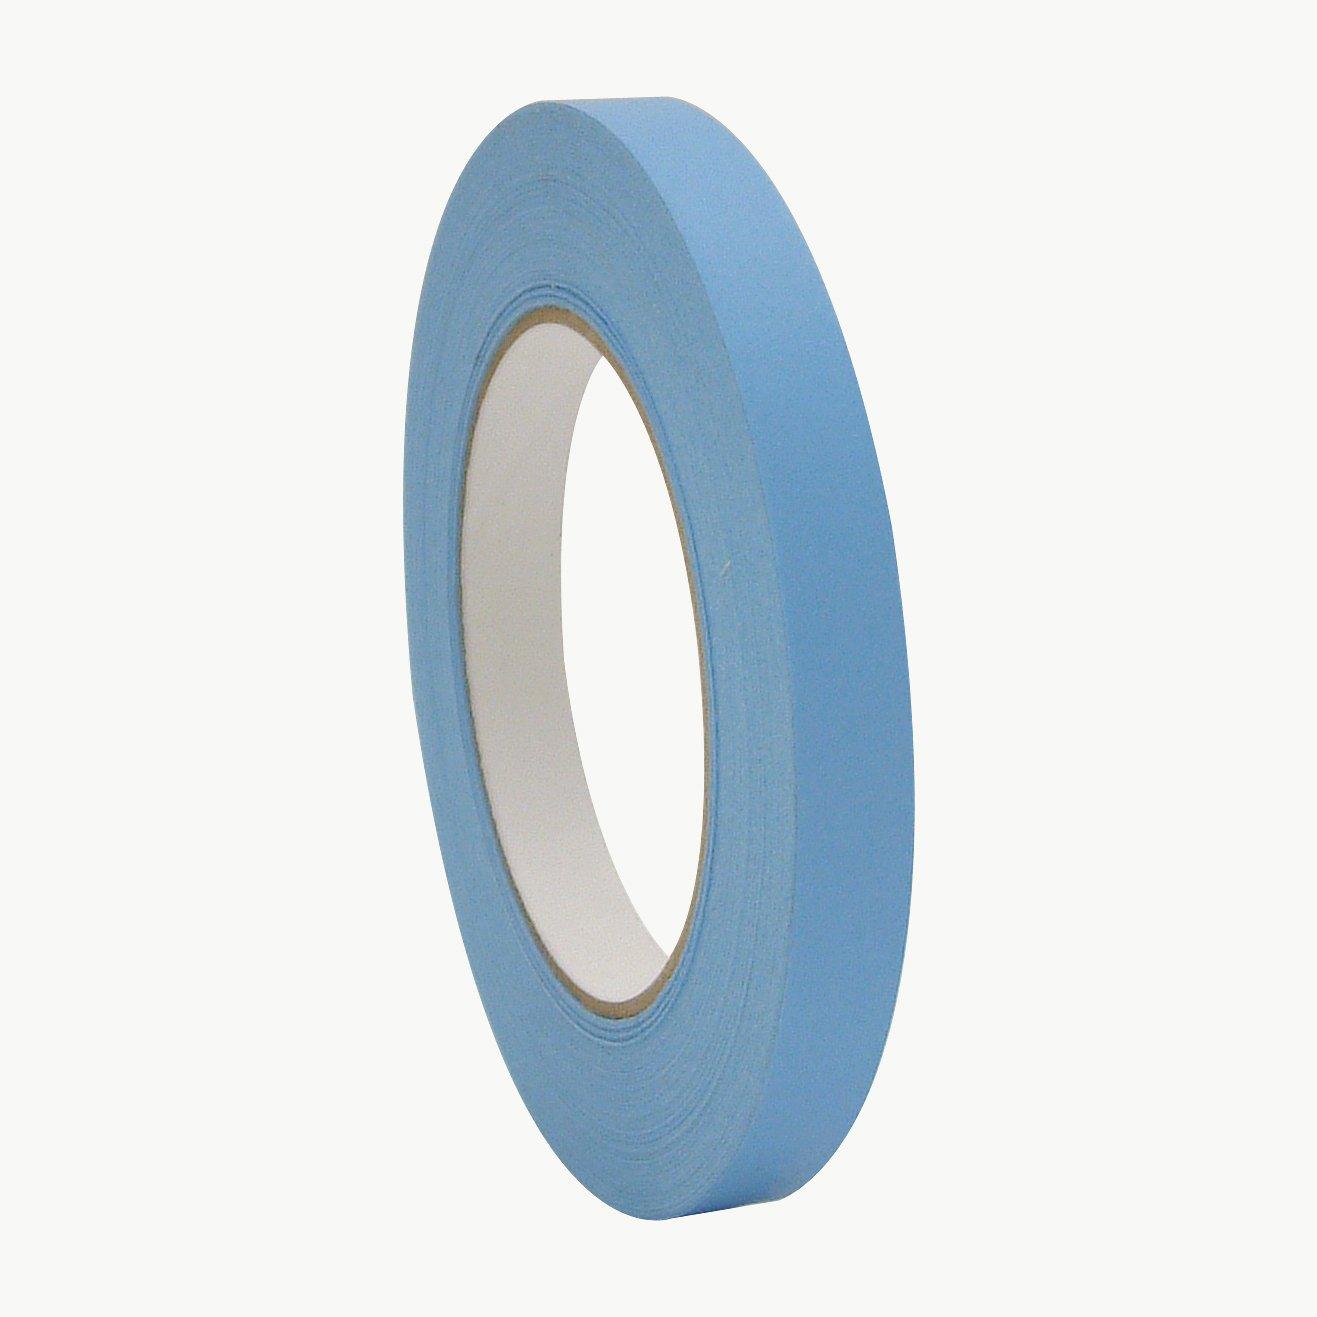 JVCC ART-11 Artist / Console Tape: 1/2 in. x 60 yds. (Blue)